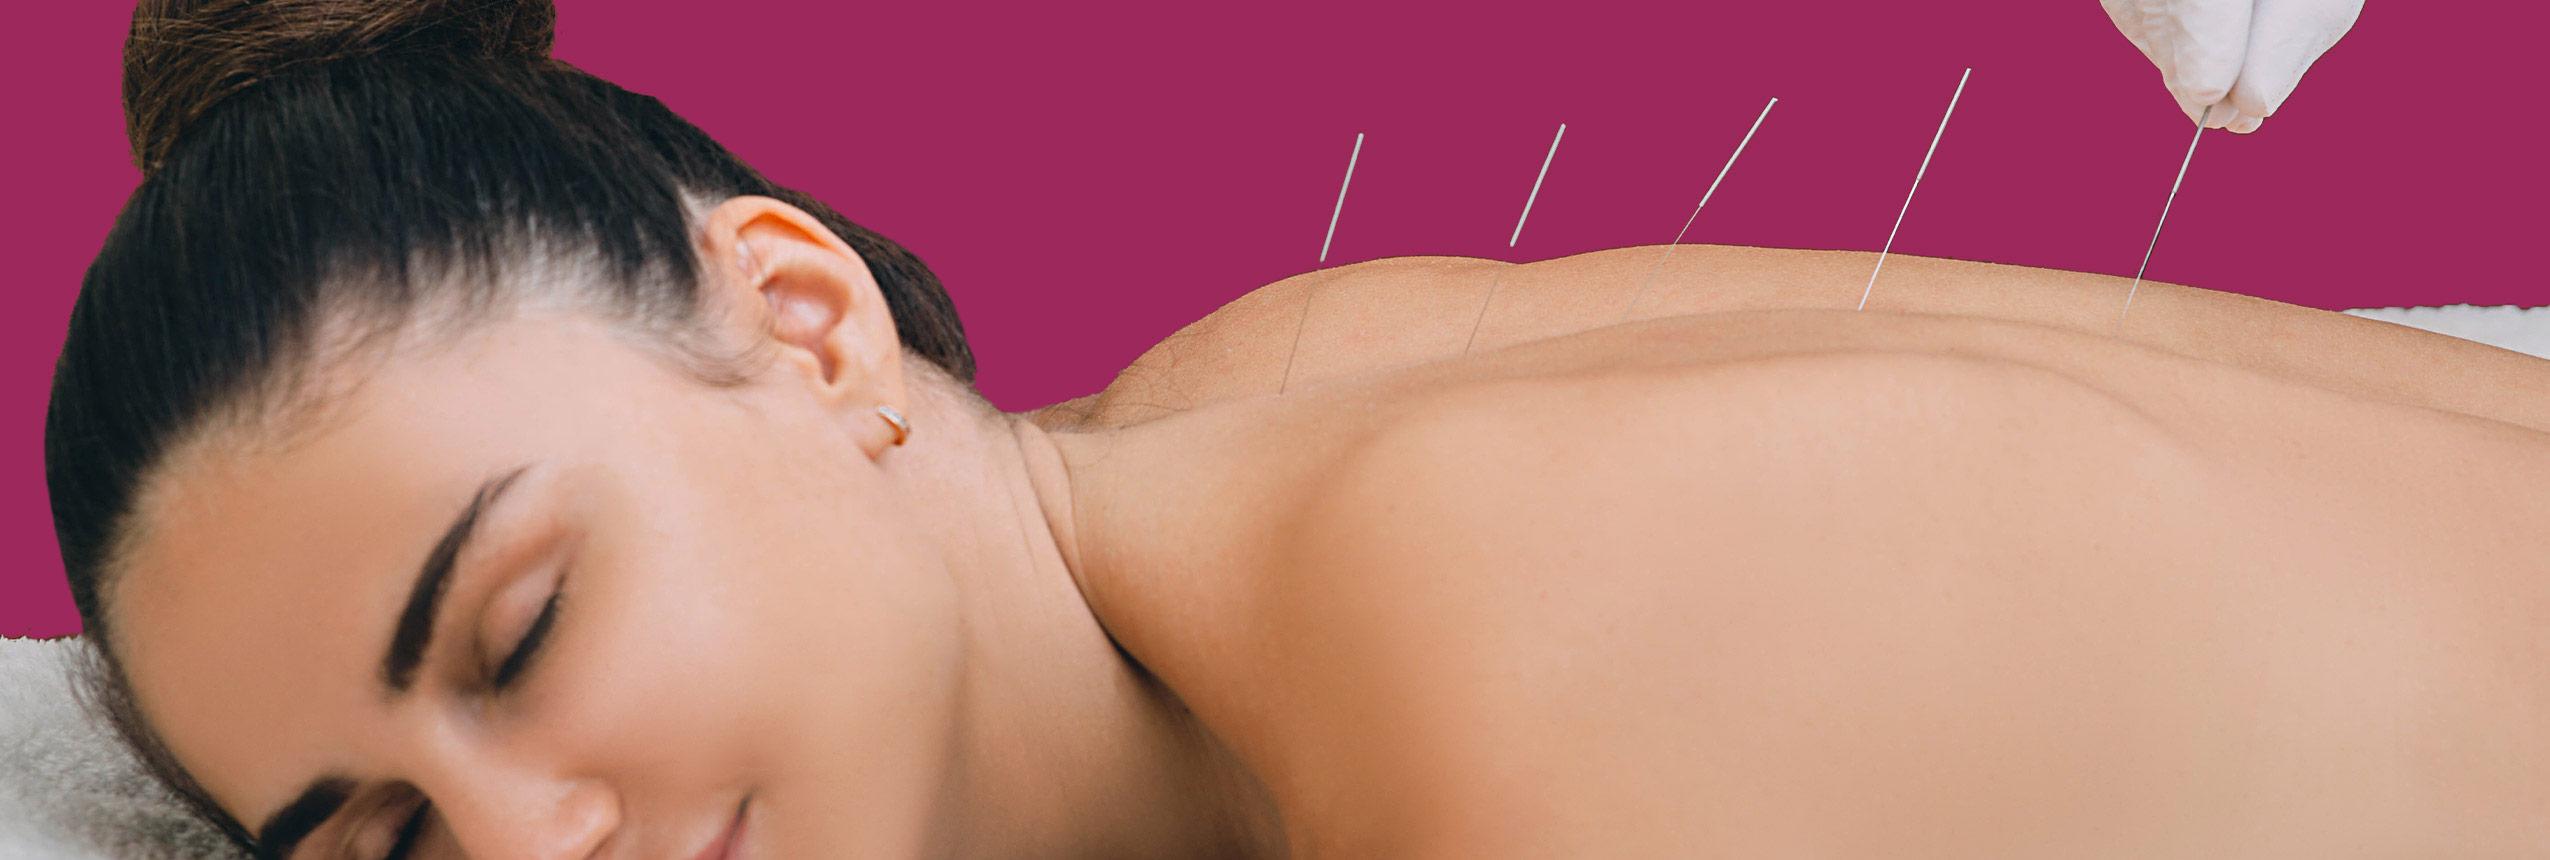 akupuntur muenchen orthopaede 2 - Akupunktur